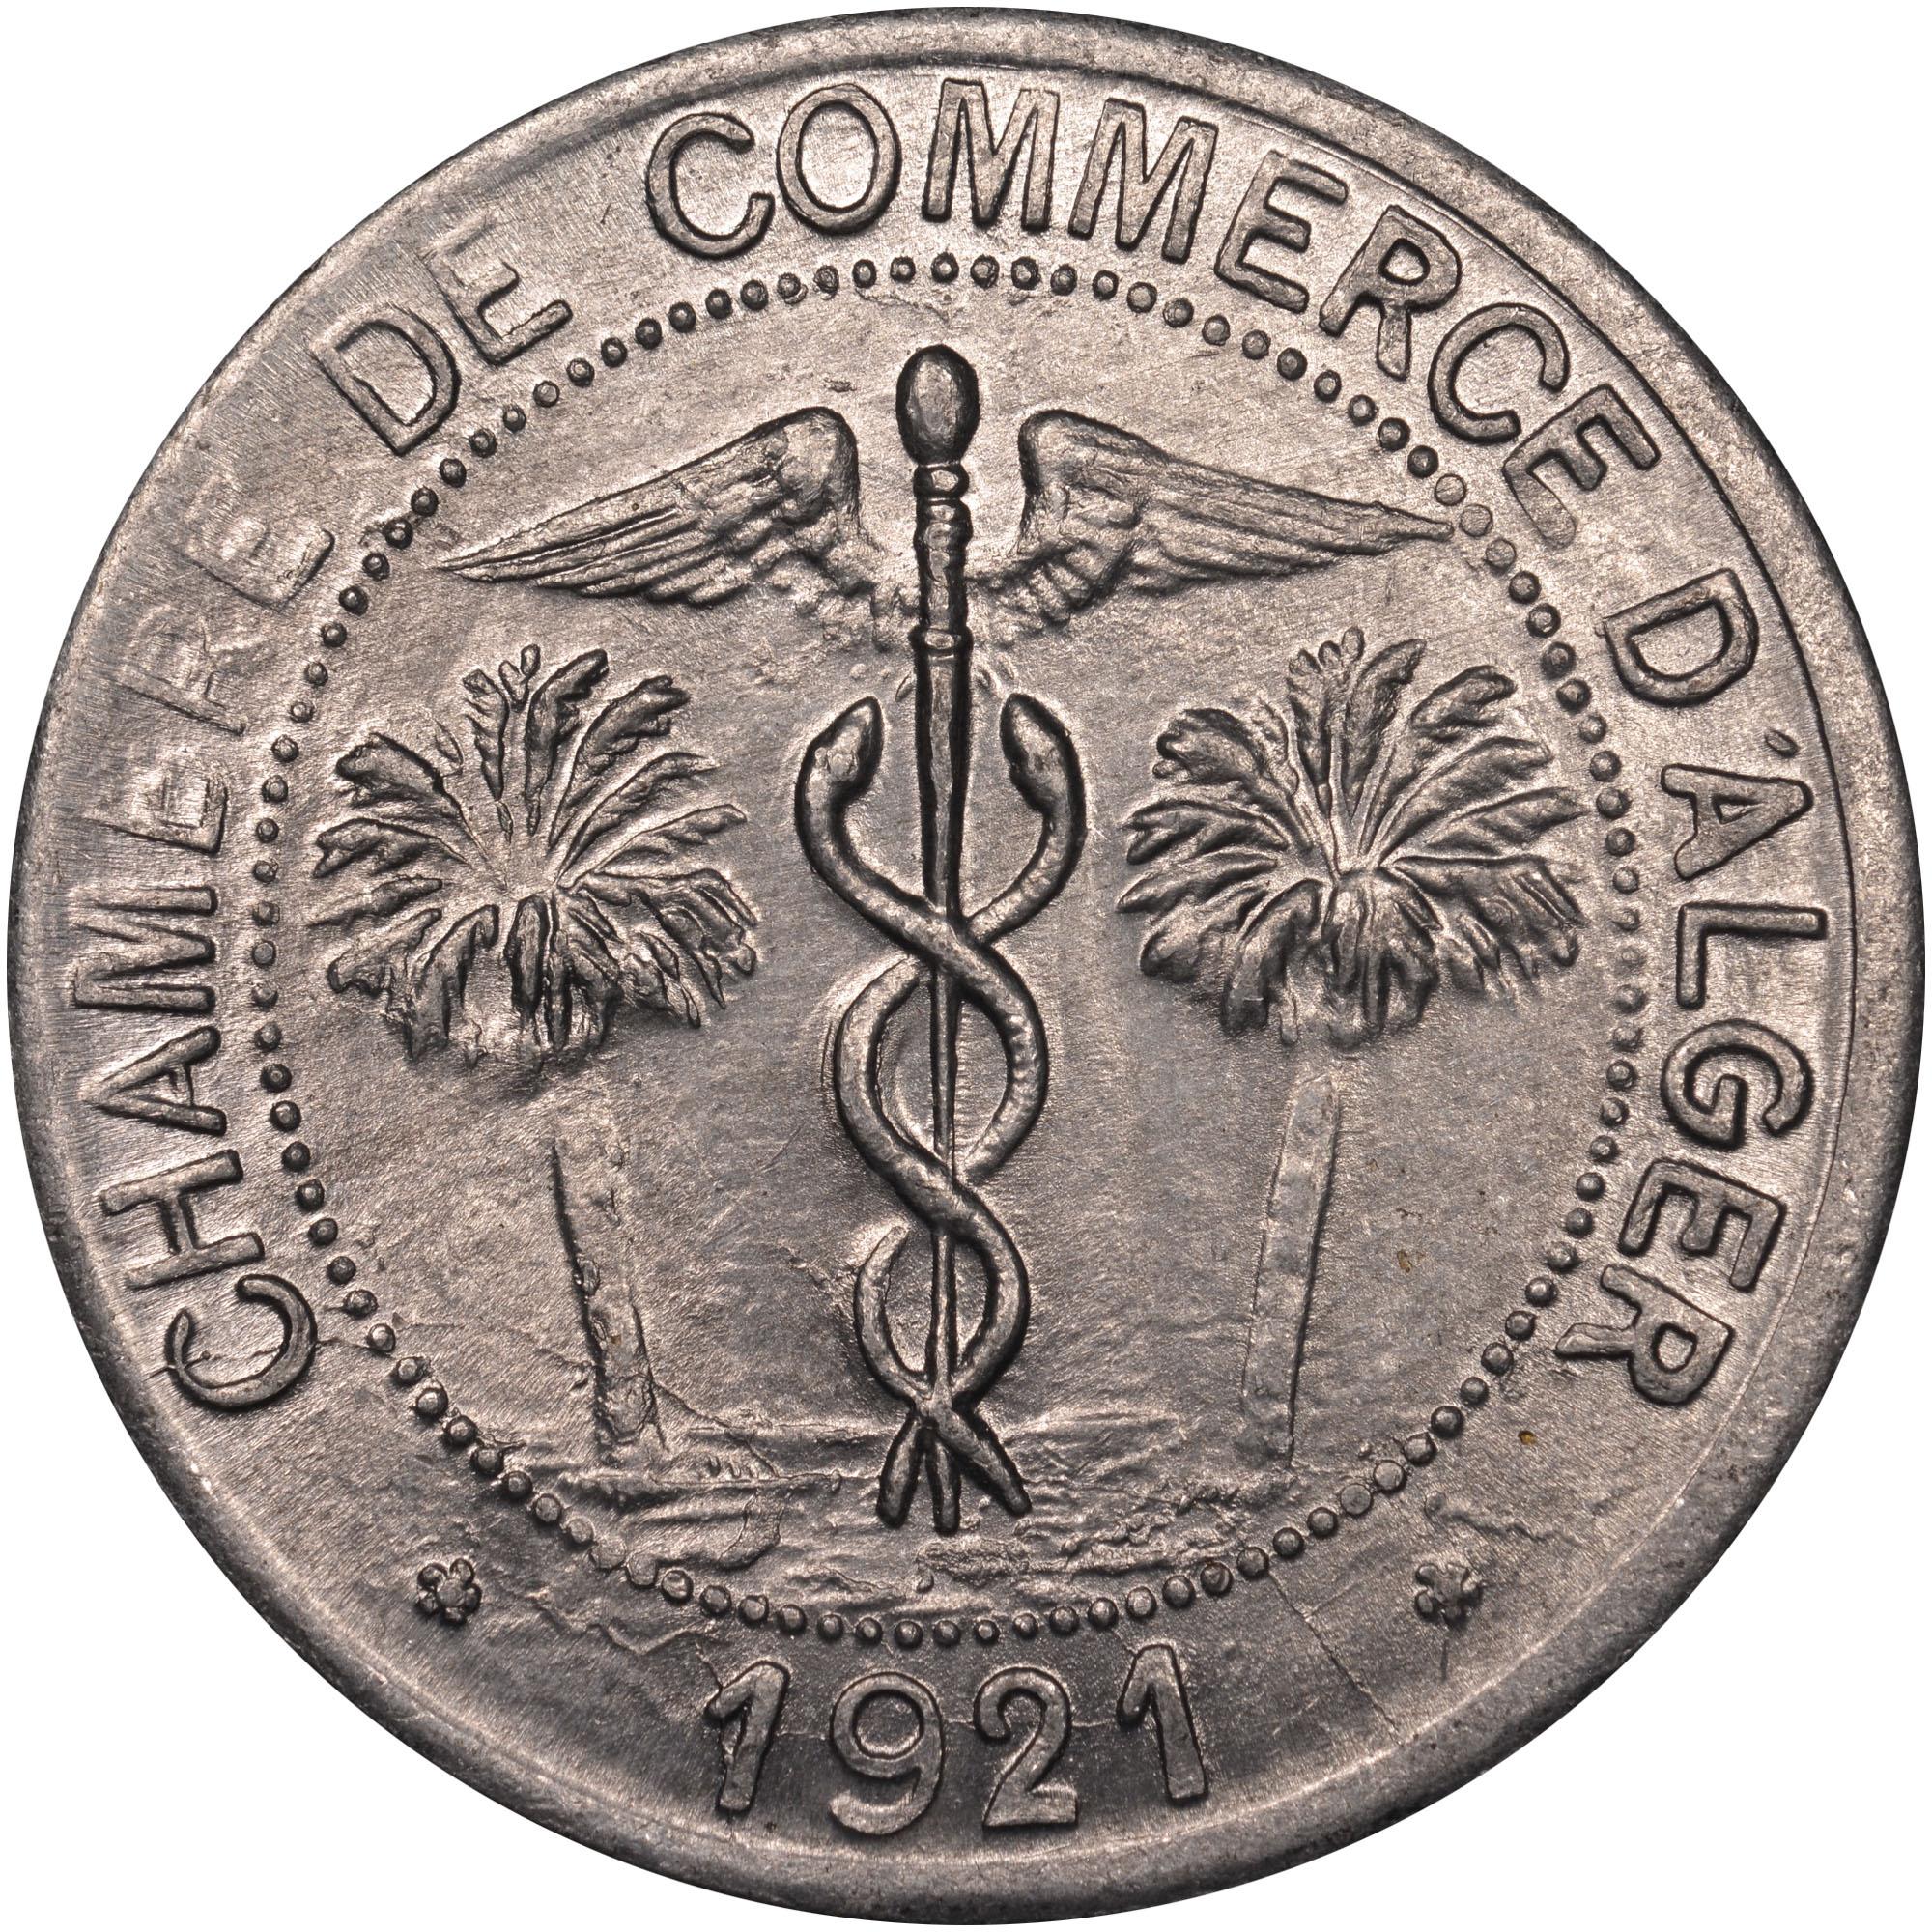 1916-1921 Algeria 10 Centimes obverse